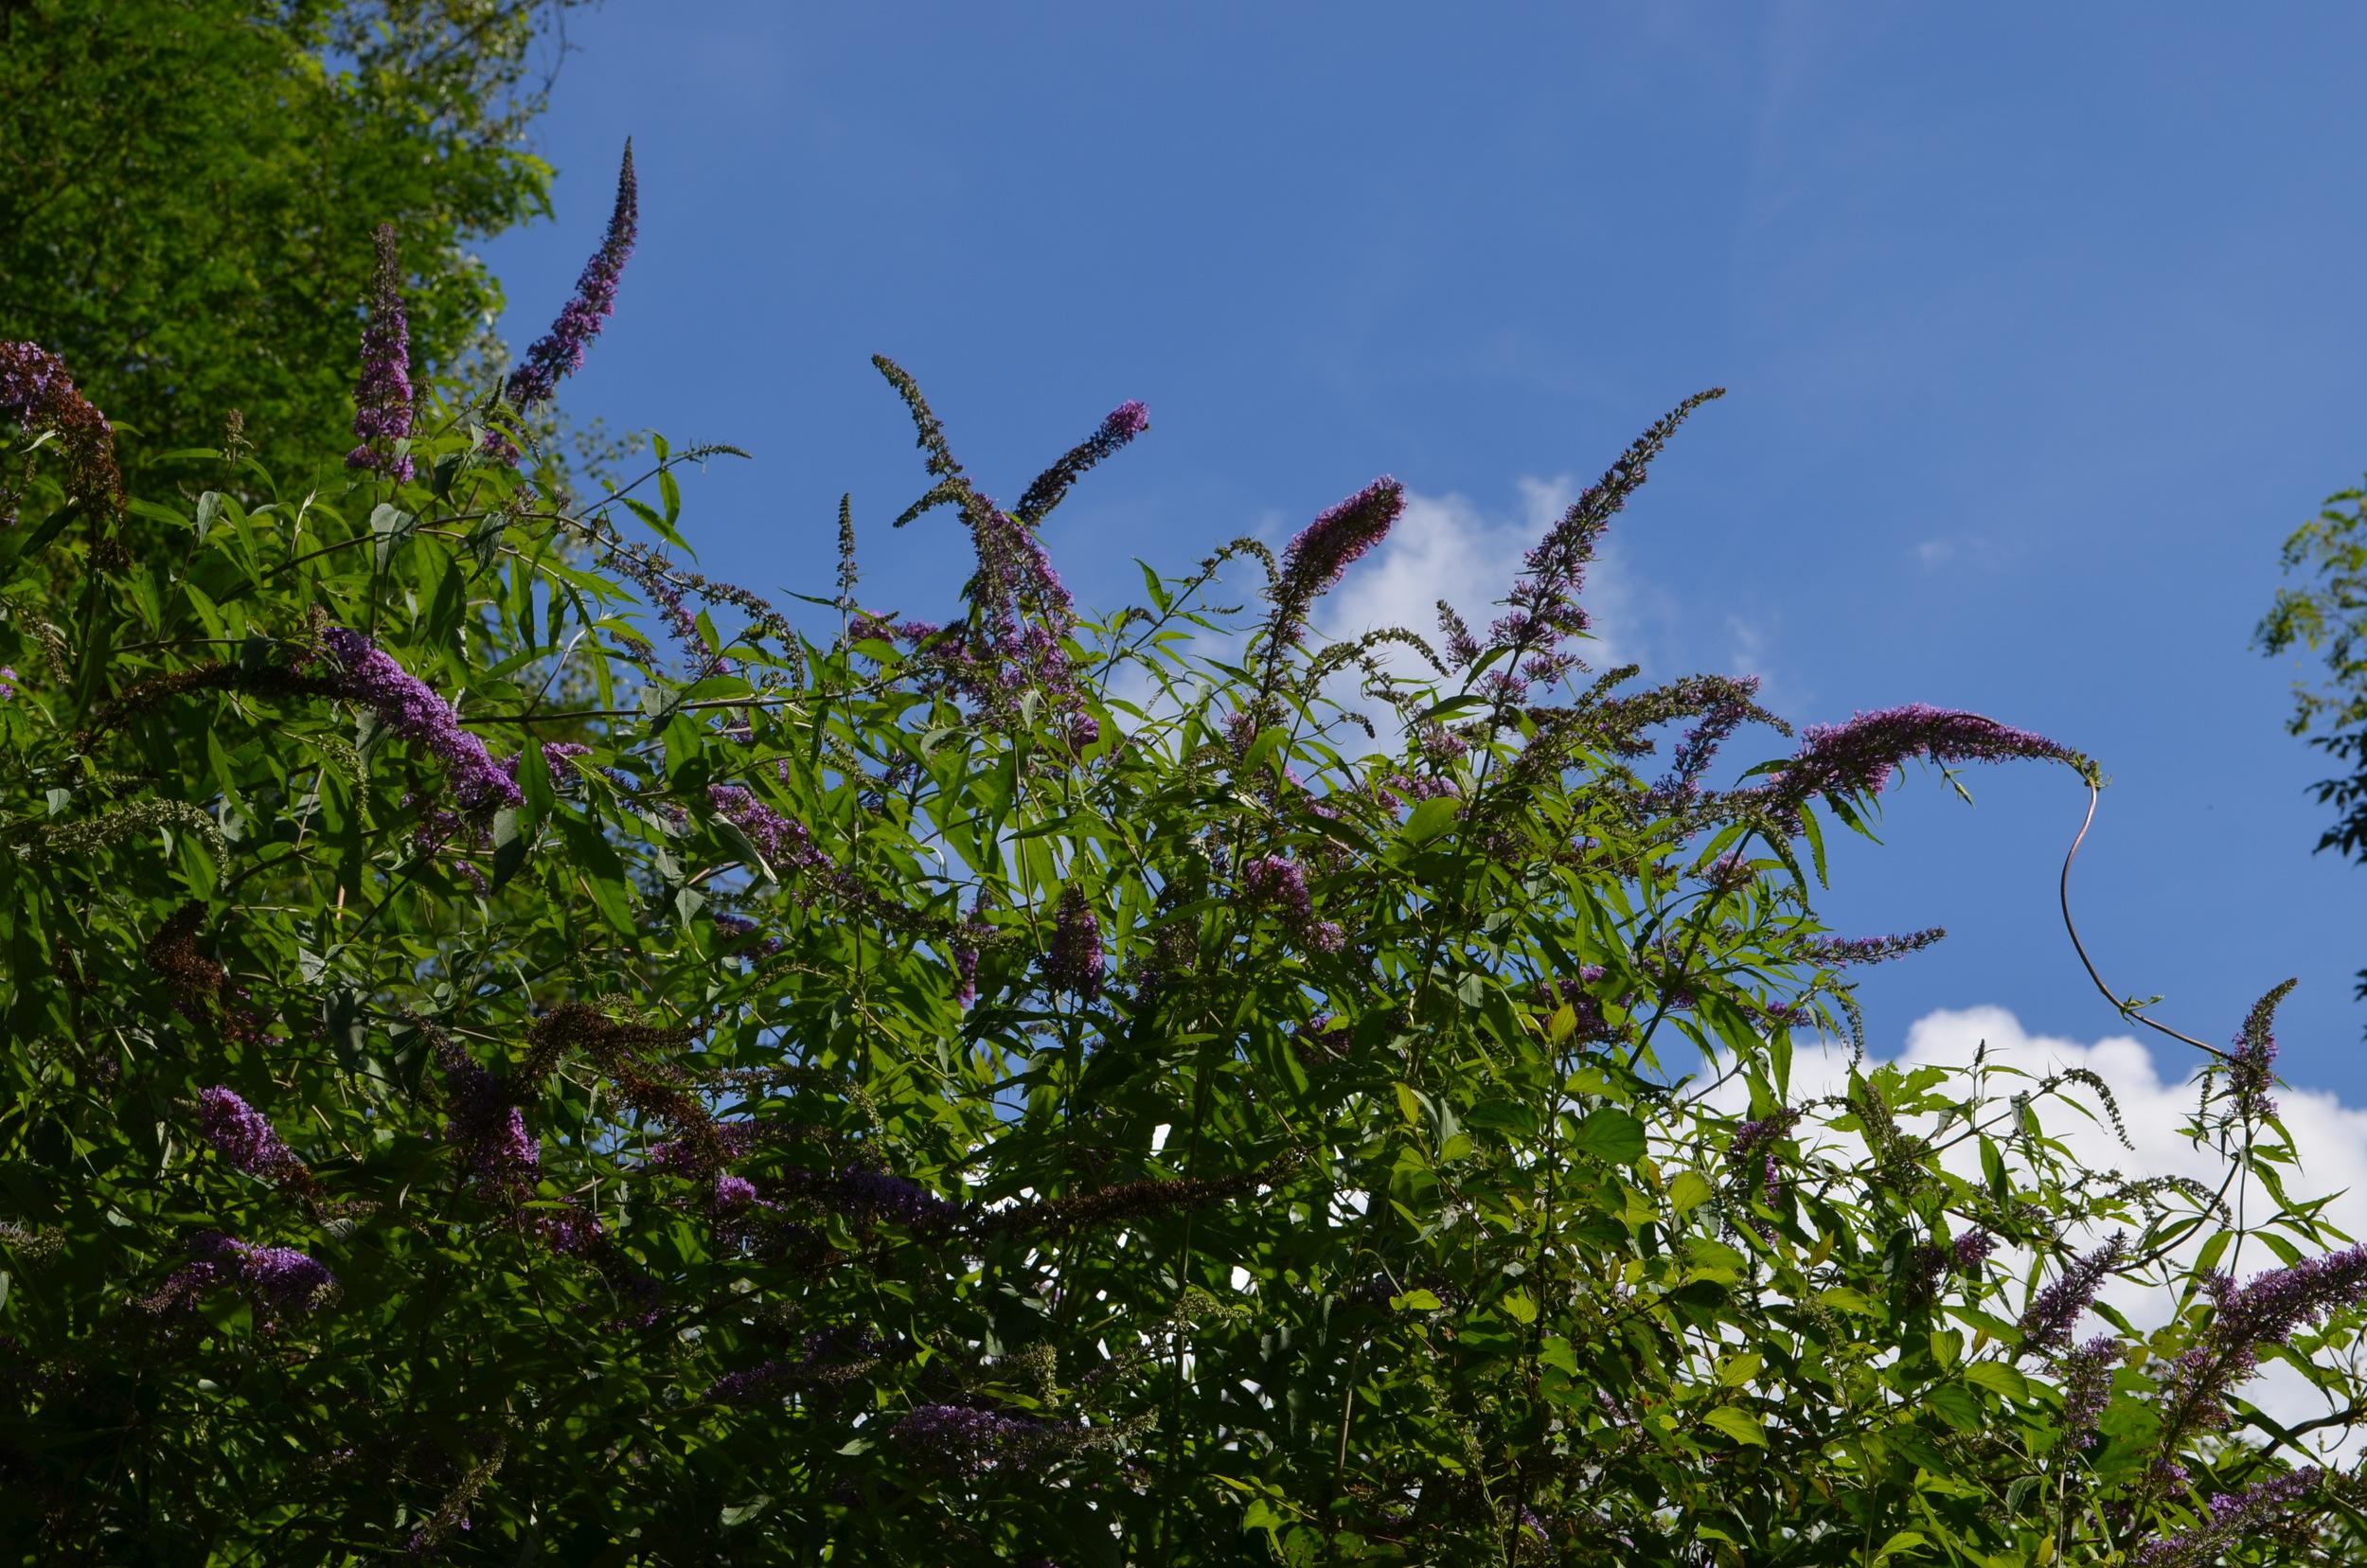 Buddleja,    Buddleja davidii    (  Scrophulariaceae)    Origine:  Cina